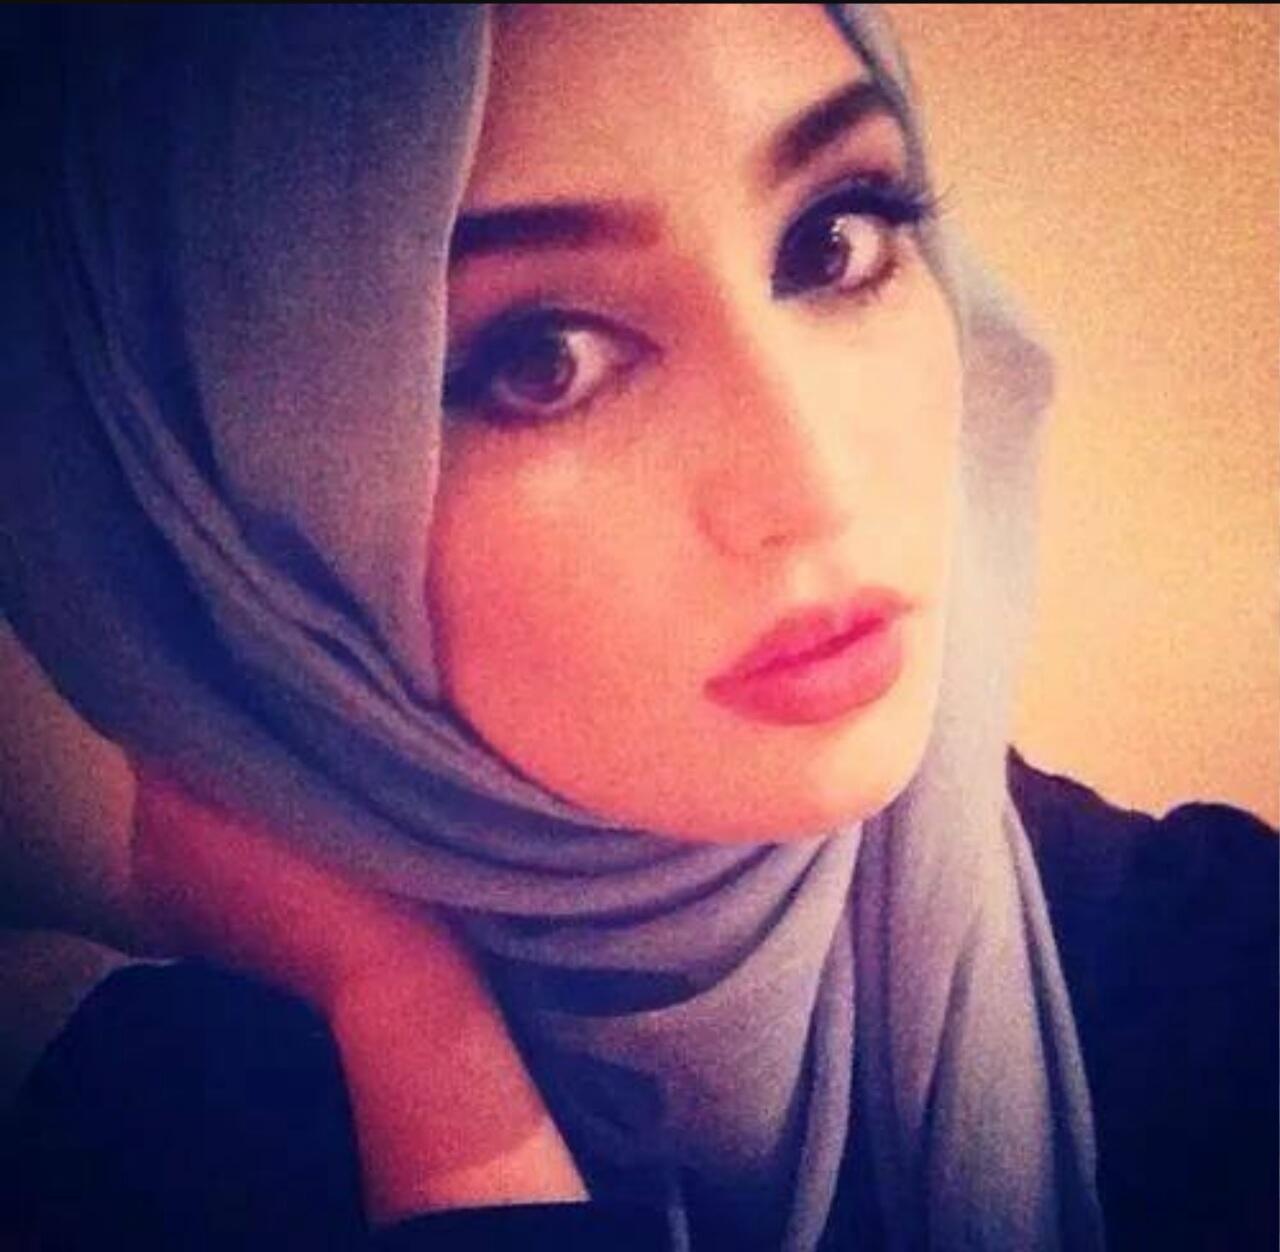 بالصور صور بنات محجبات حلوات , جمال البنات المحجبات 3327 4